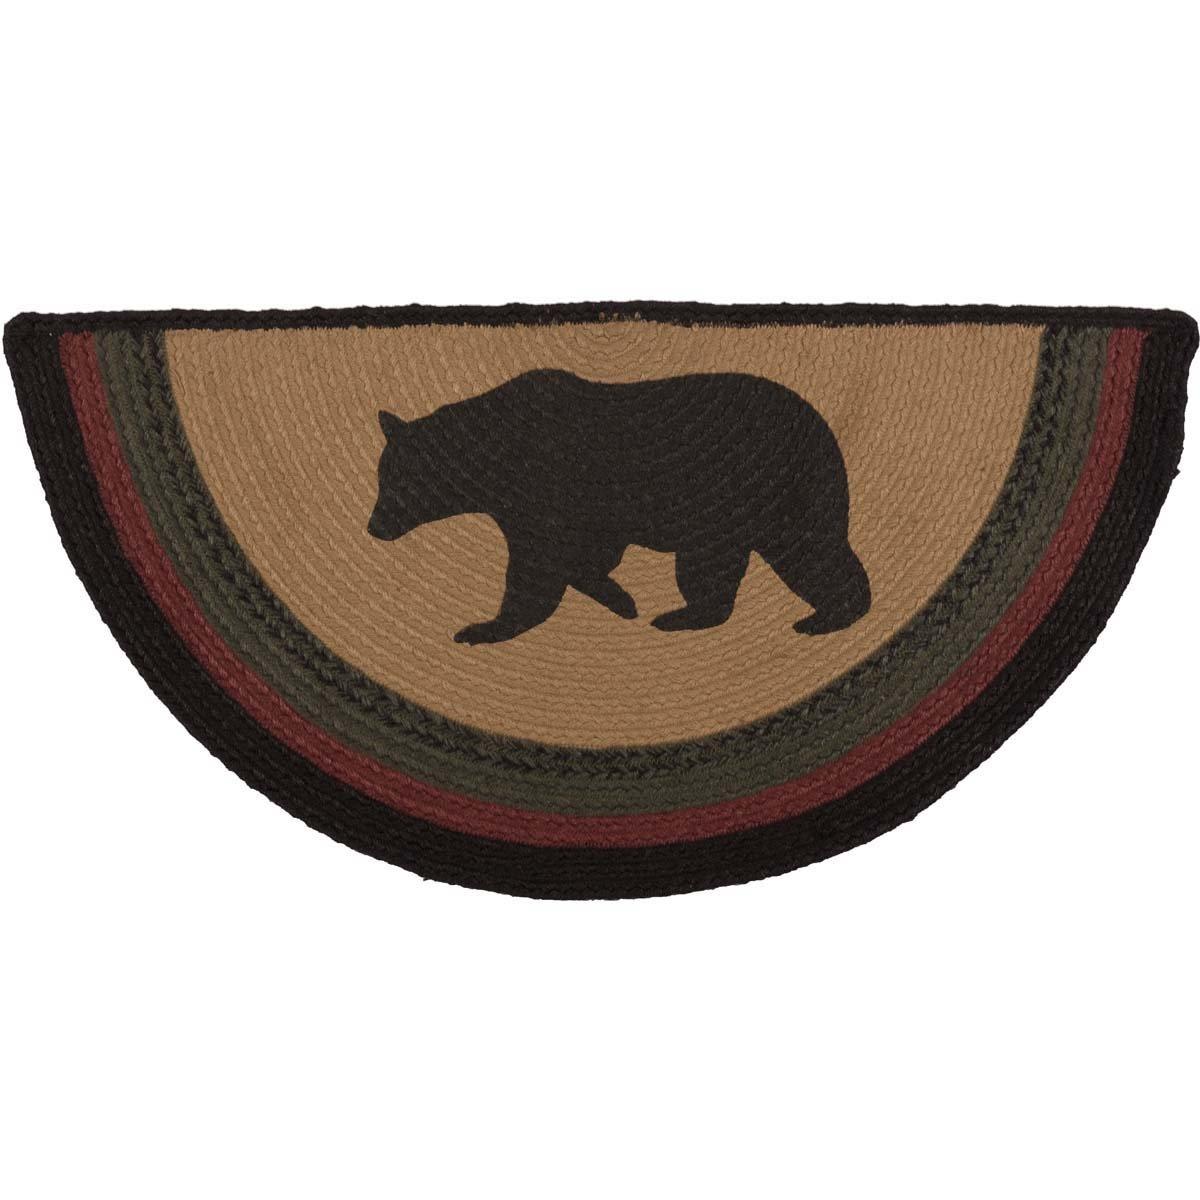 VHC Brands 38073 Rustic & Lodge Flooring-Wyatt Tan Bear Half Circle Jute Rug, 16.5 x 33